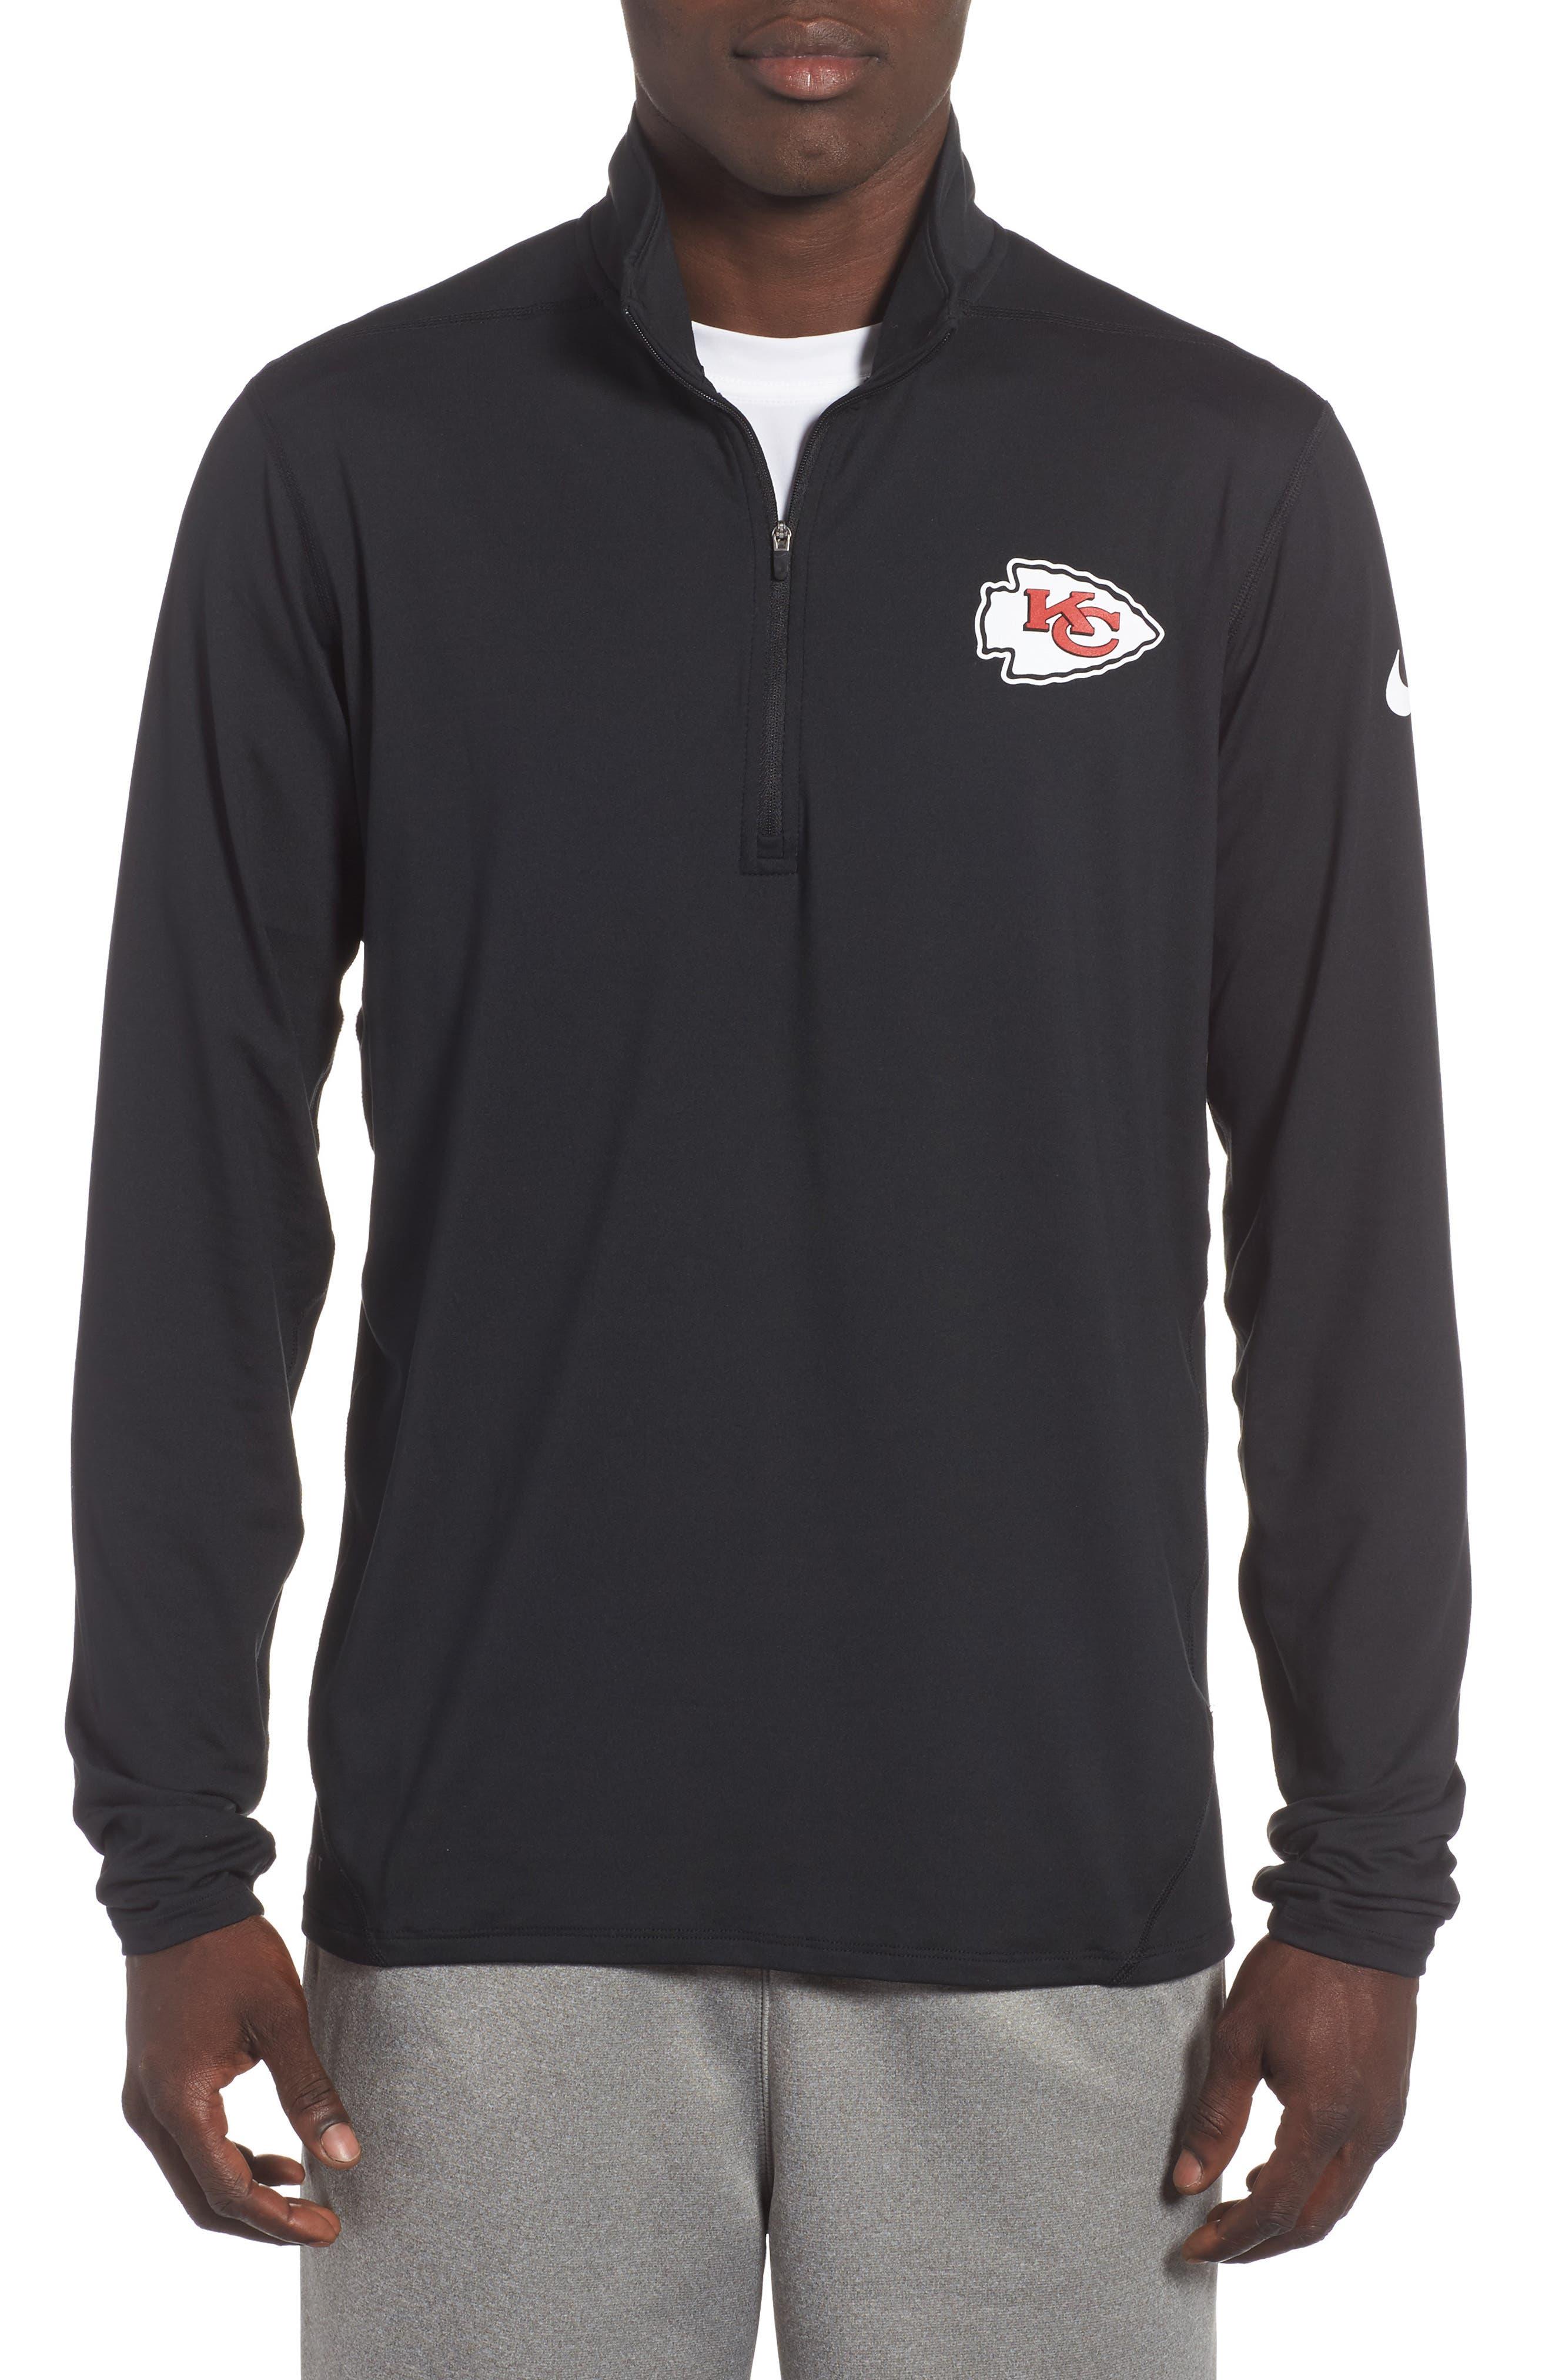 Main Image - Nike NFL Team Element Quarter Zip Pullover